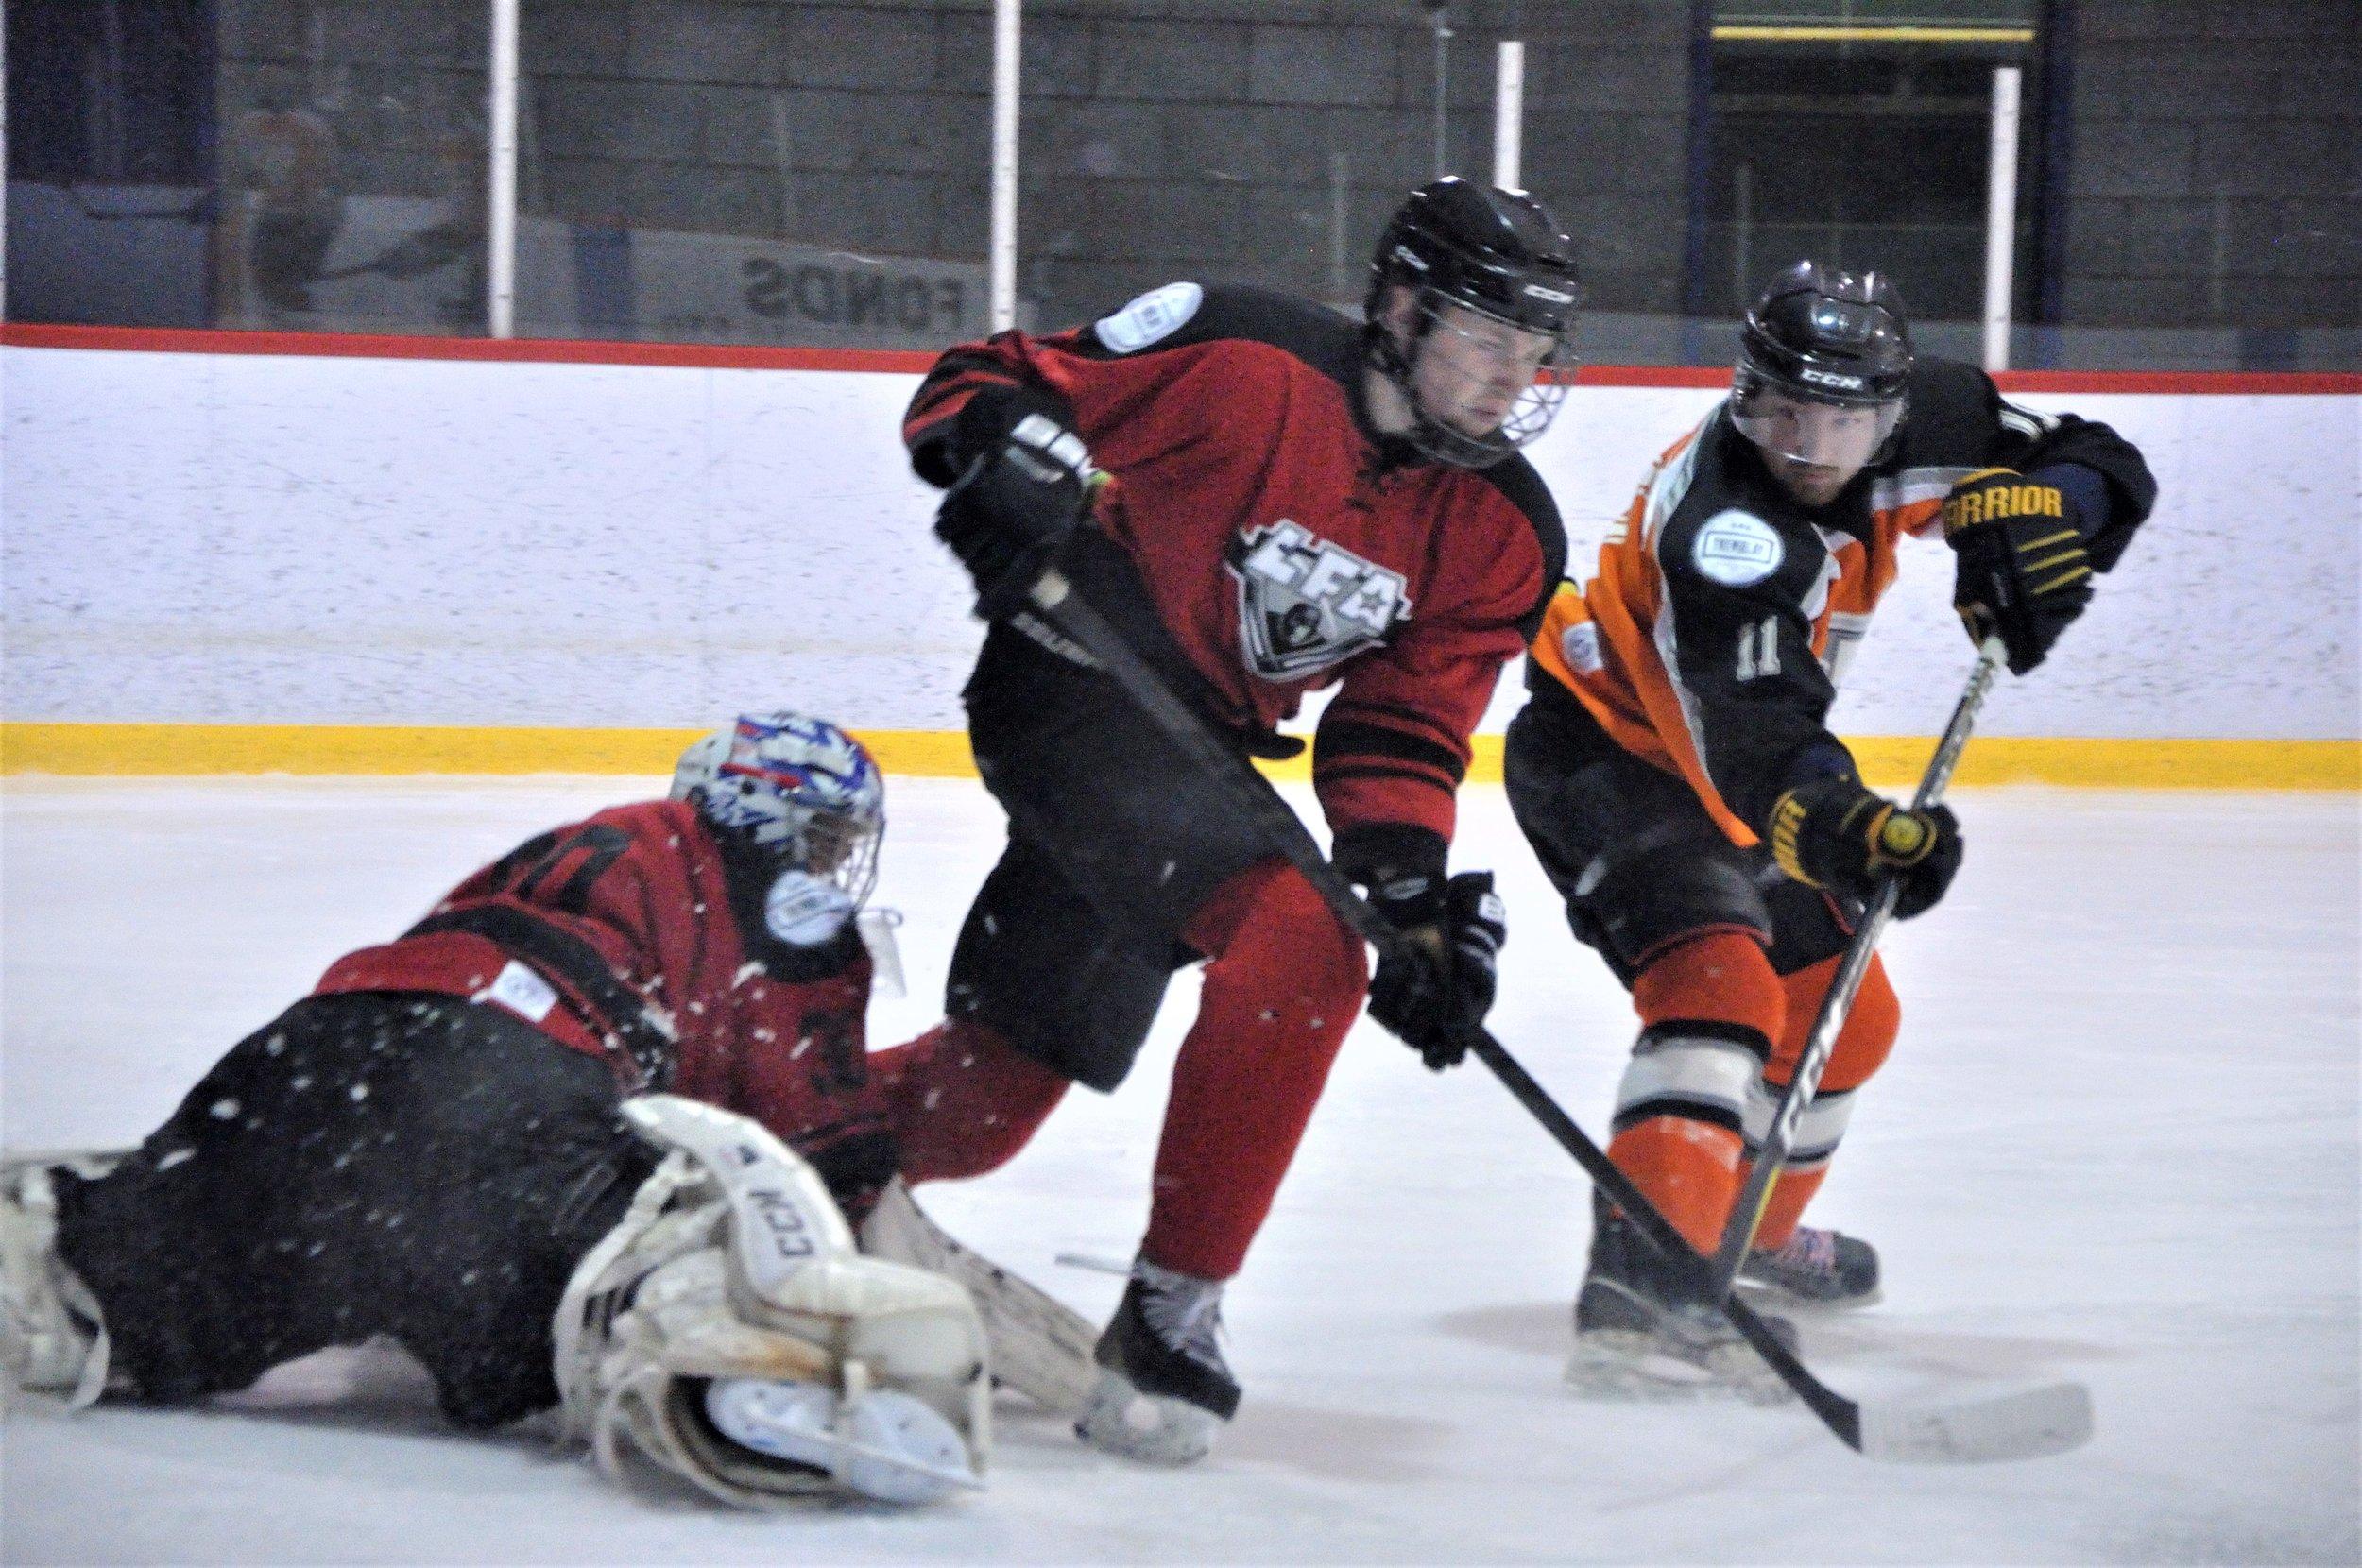 Tomahawks vs Les Météores (photo lisette nepveu)